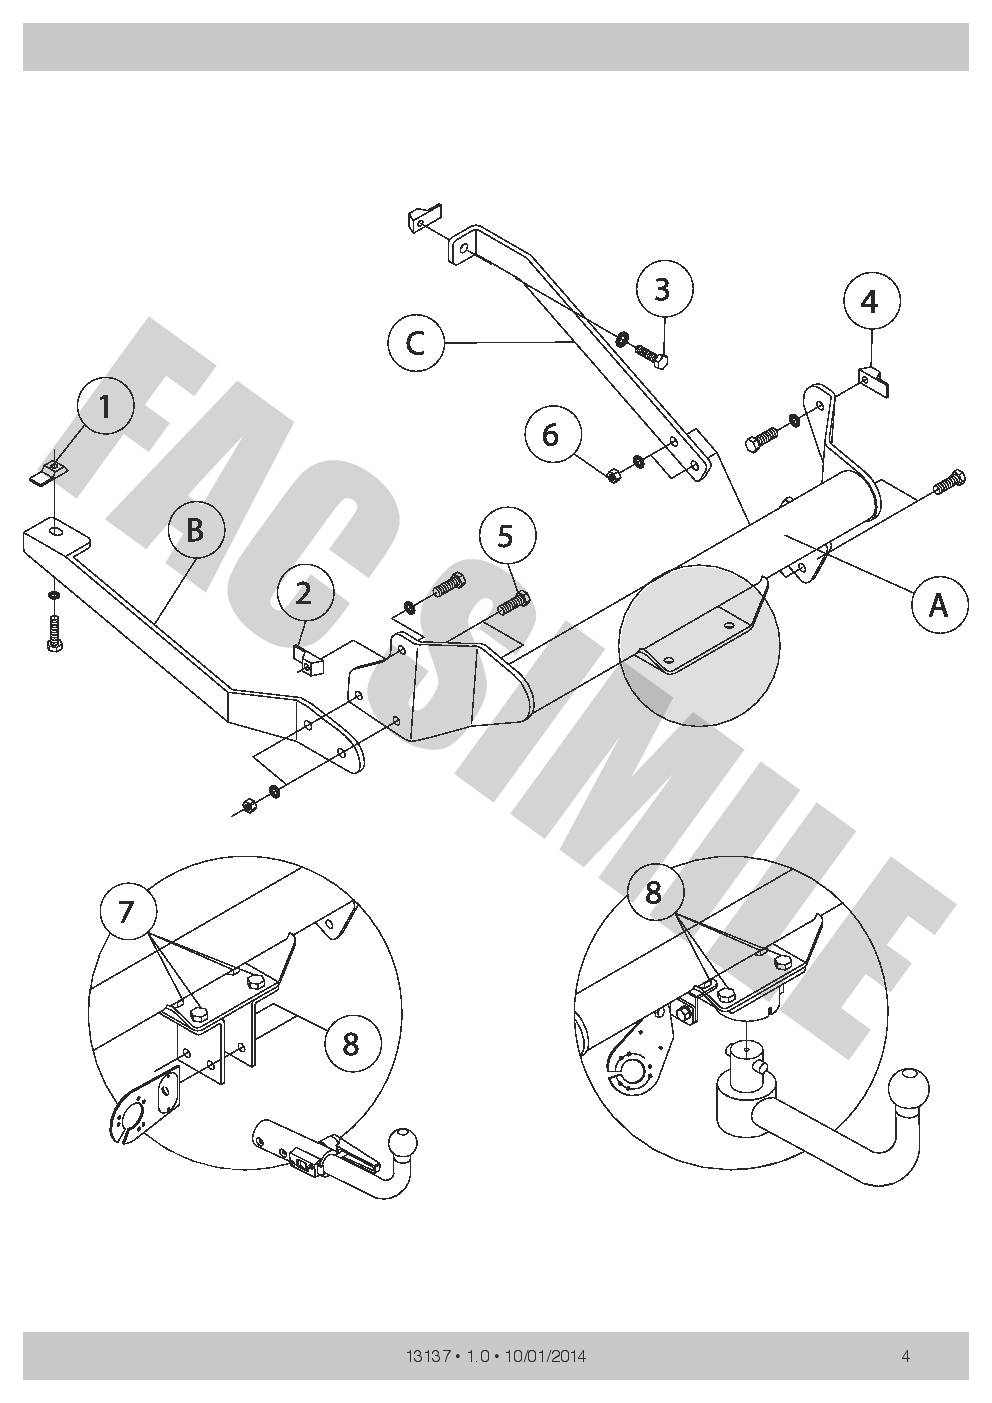 AHK Abnehmbare Anhängerkupplung 1313/_B8 13p C2 E-Satz Peugeot 807 MPV 2005